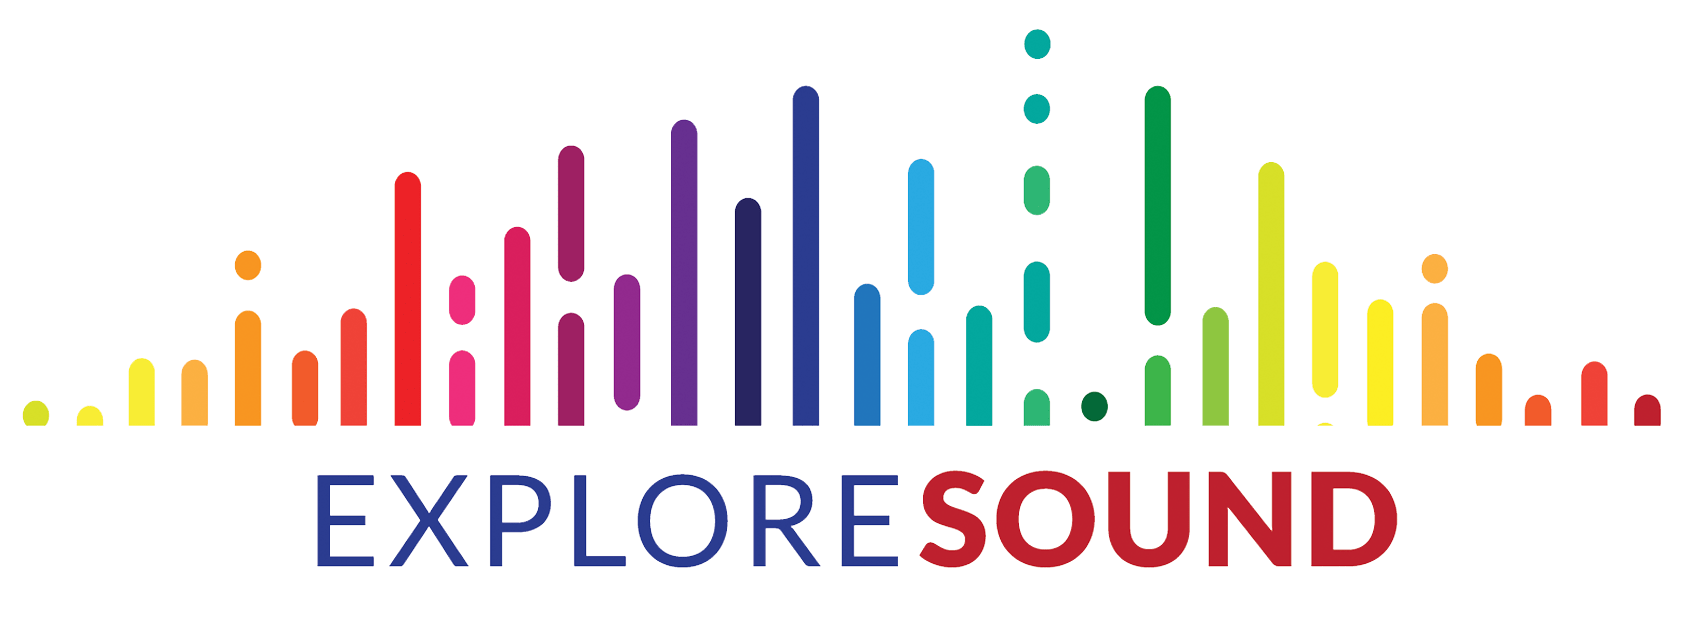 medium resolution of Sound Wave Lab - Explore Sound